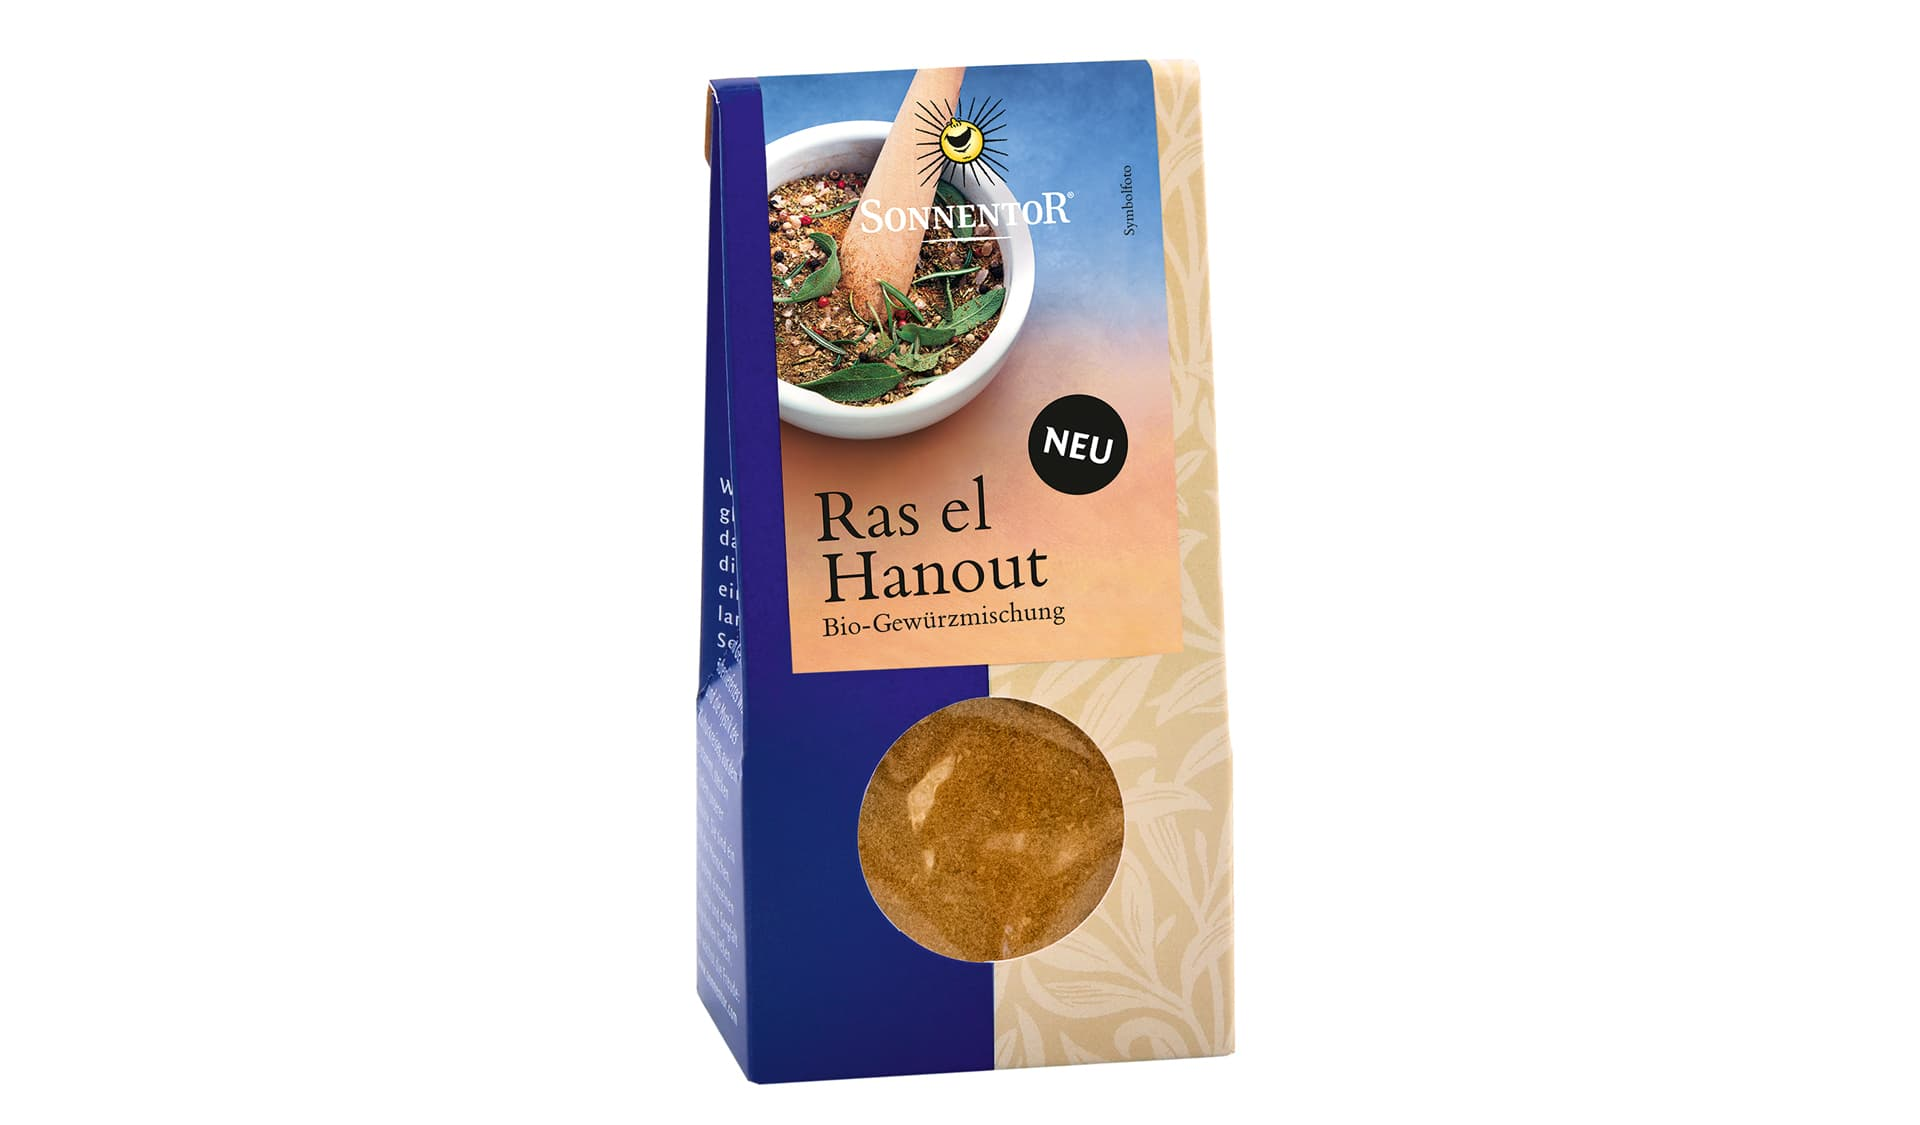 Sonnentor Ras el-Hanout (www.sonnentor.com)